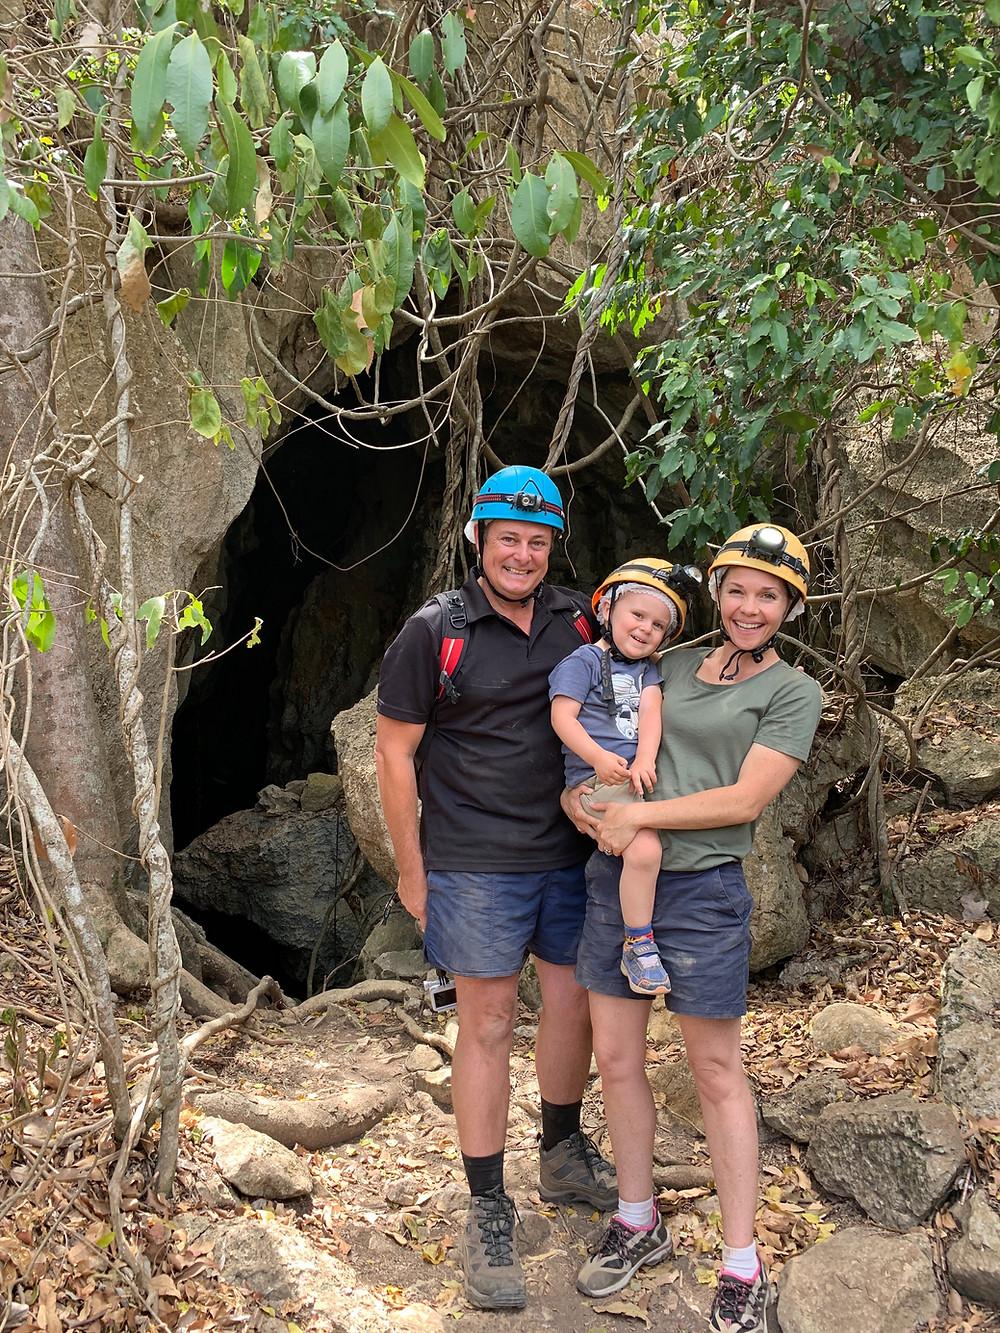 Capricorn Caves, Adventure, Caving, Family